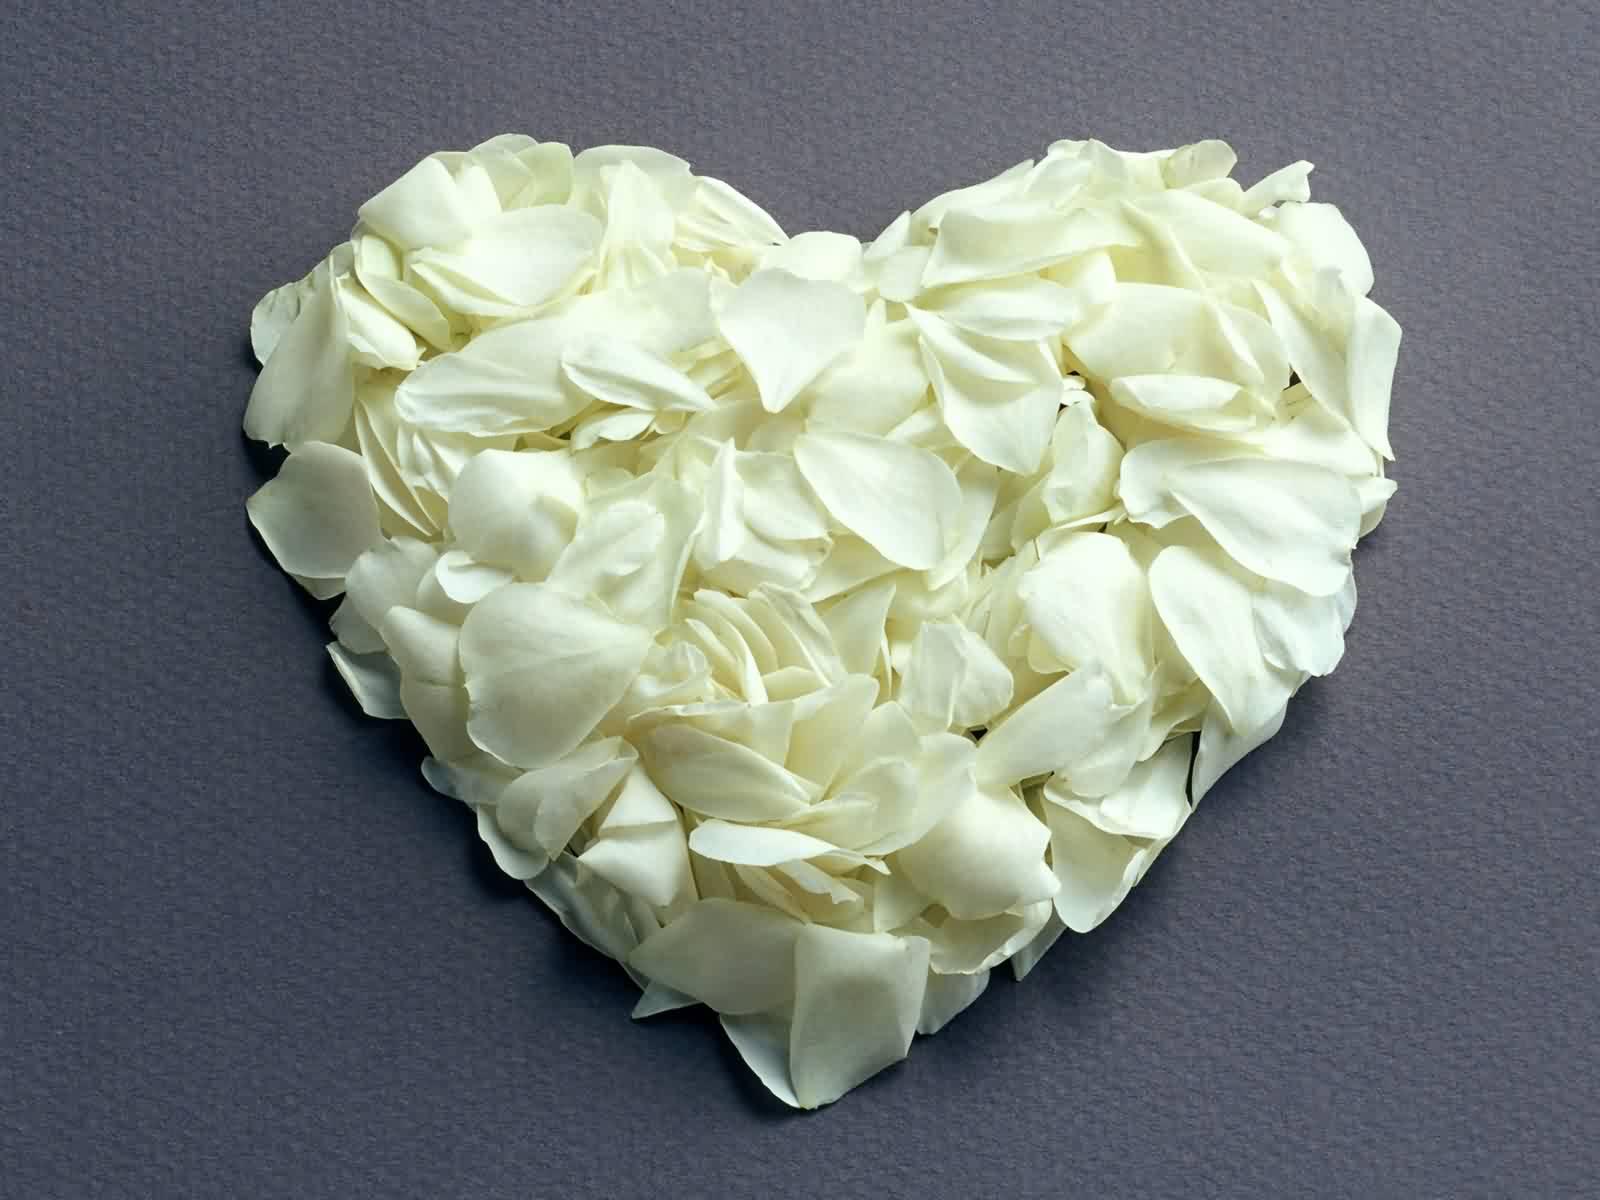 White Roses Tumblr